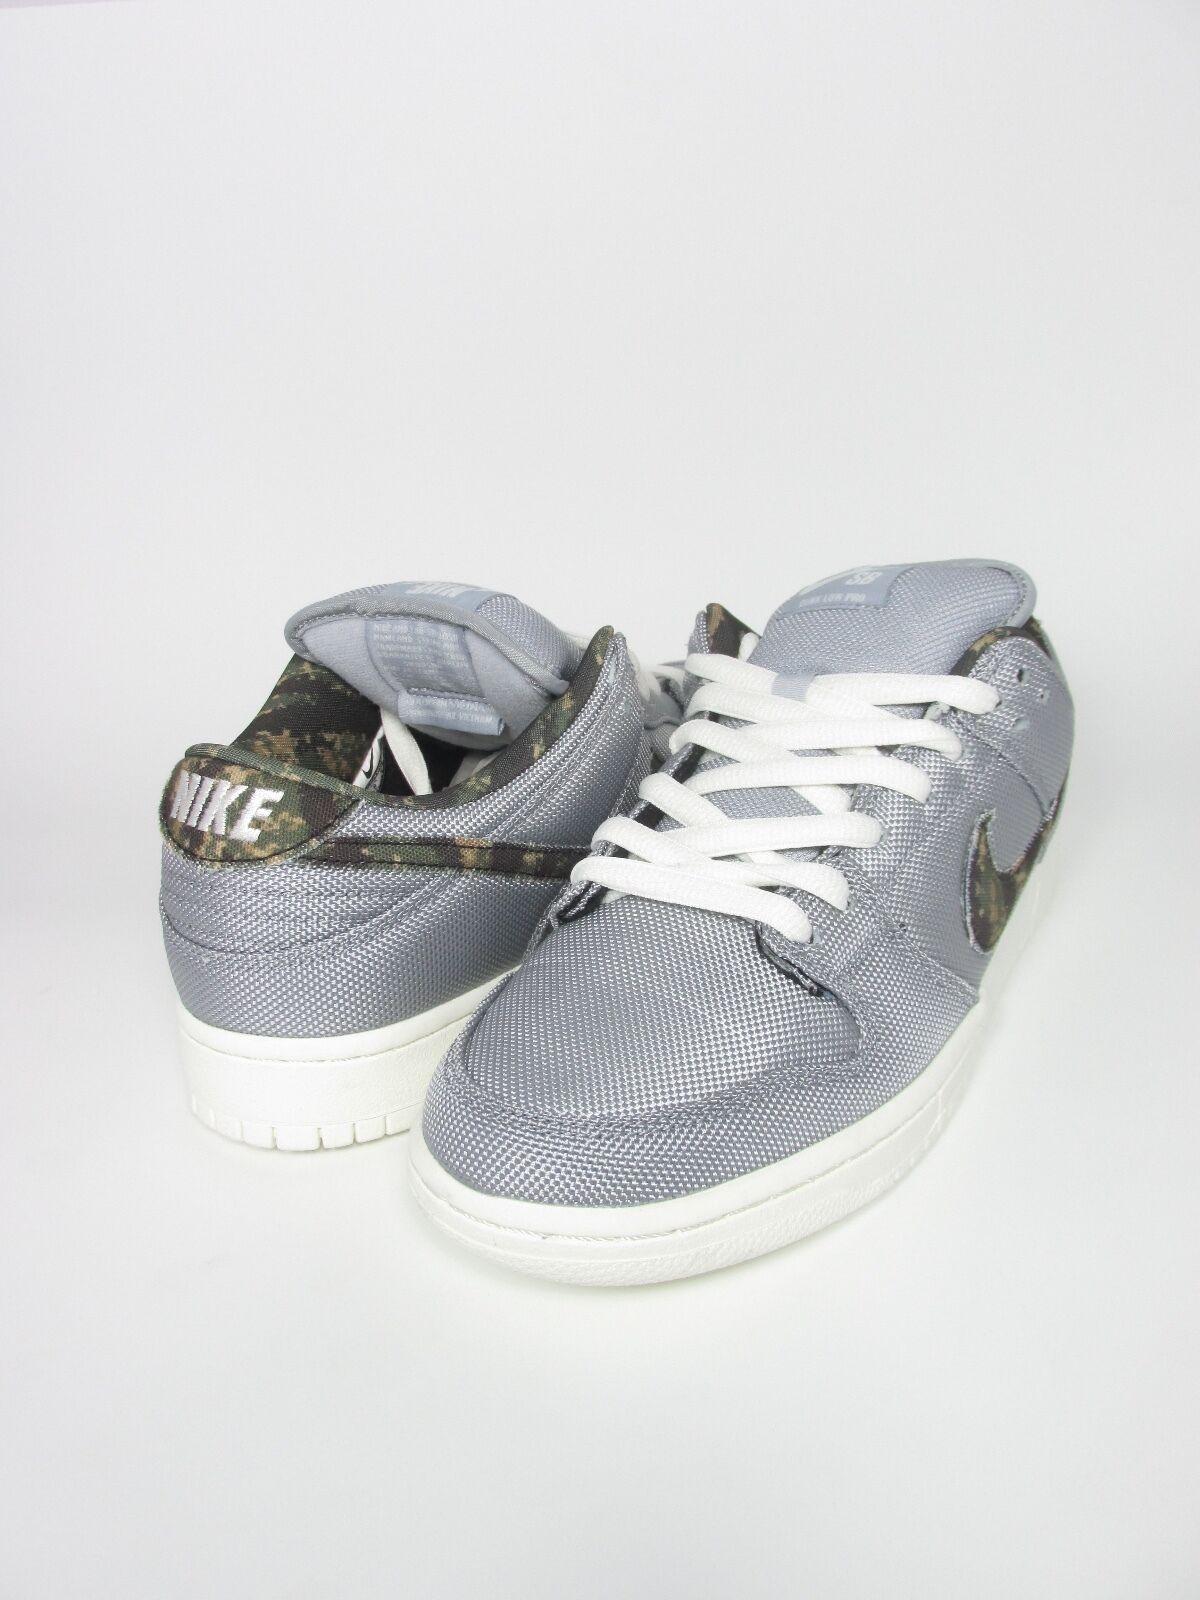 Nuevos gris Hombres Nike Dunk Low pro Skate lobo gris Nuevos oliva 304292054 media vela 05697e